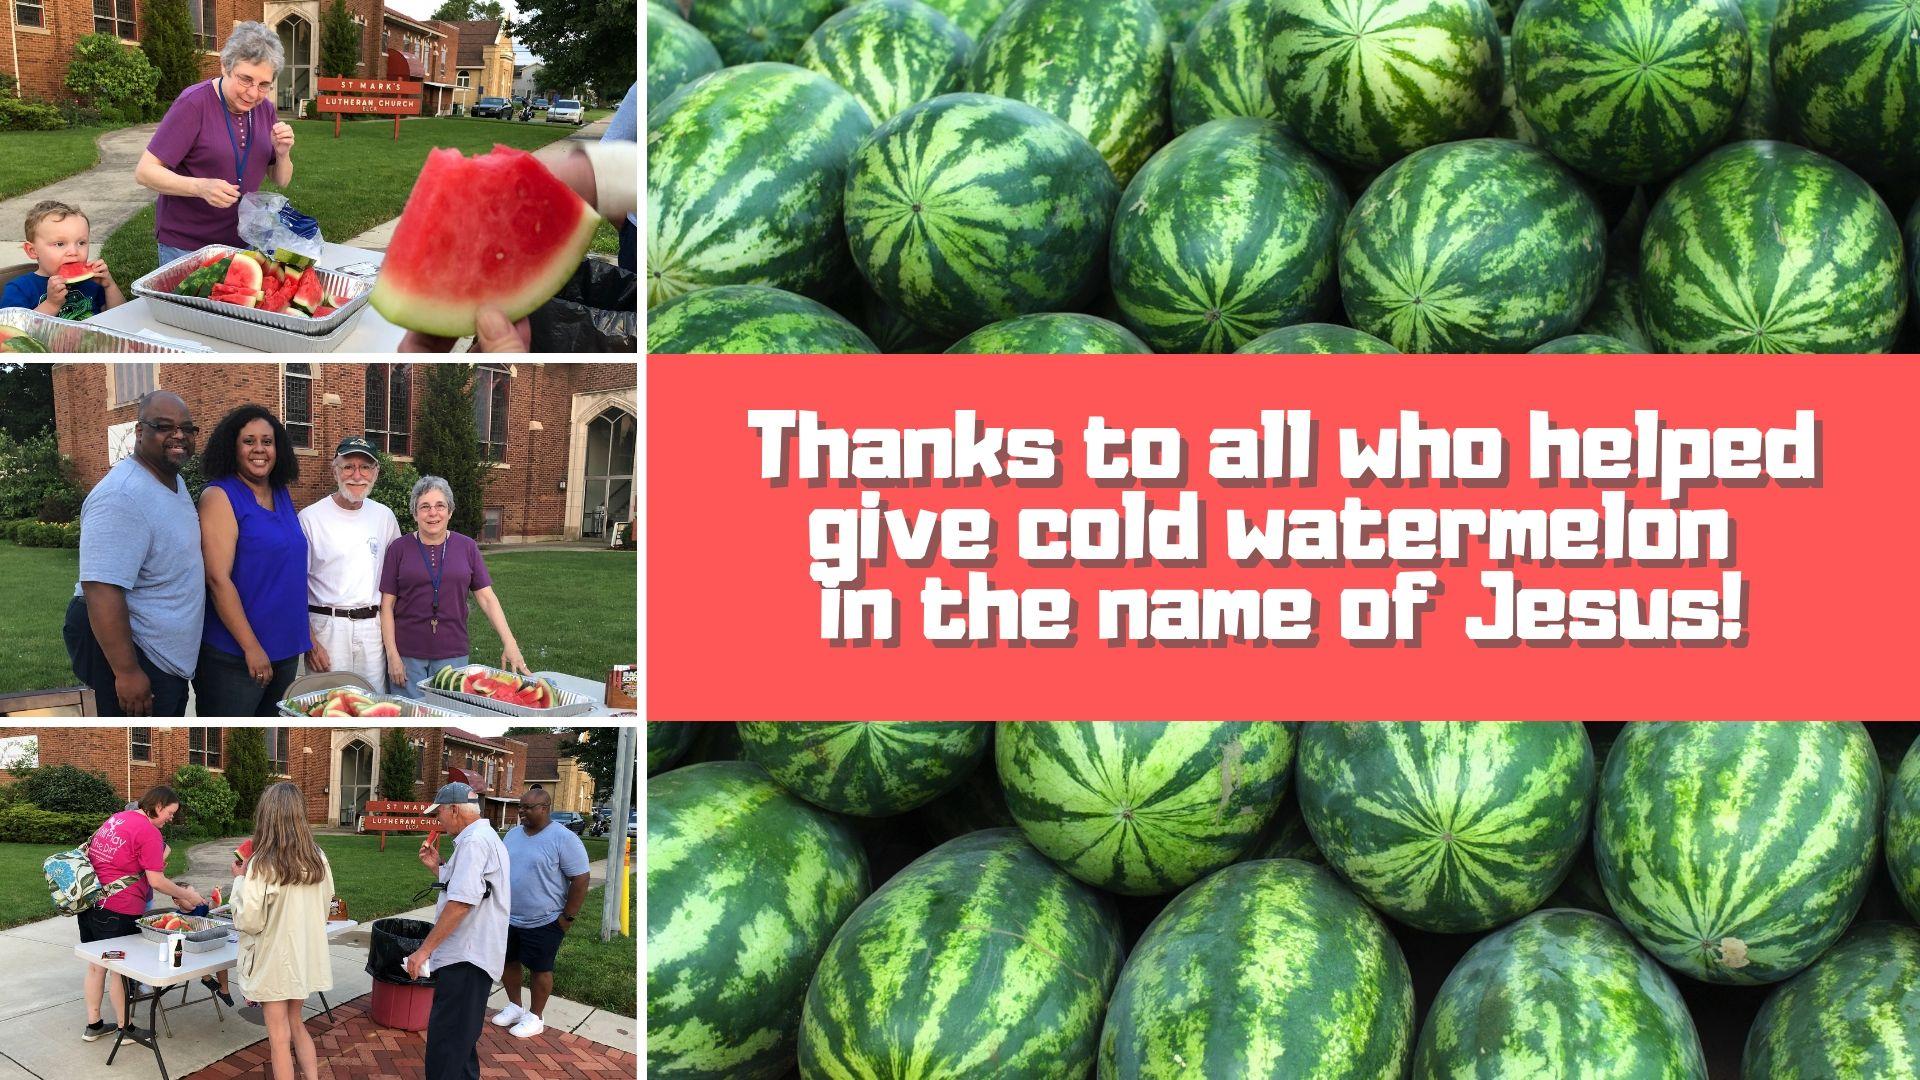 190703-WatermelonGiveawayThanks.jpg